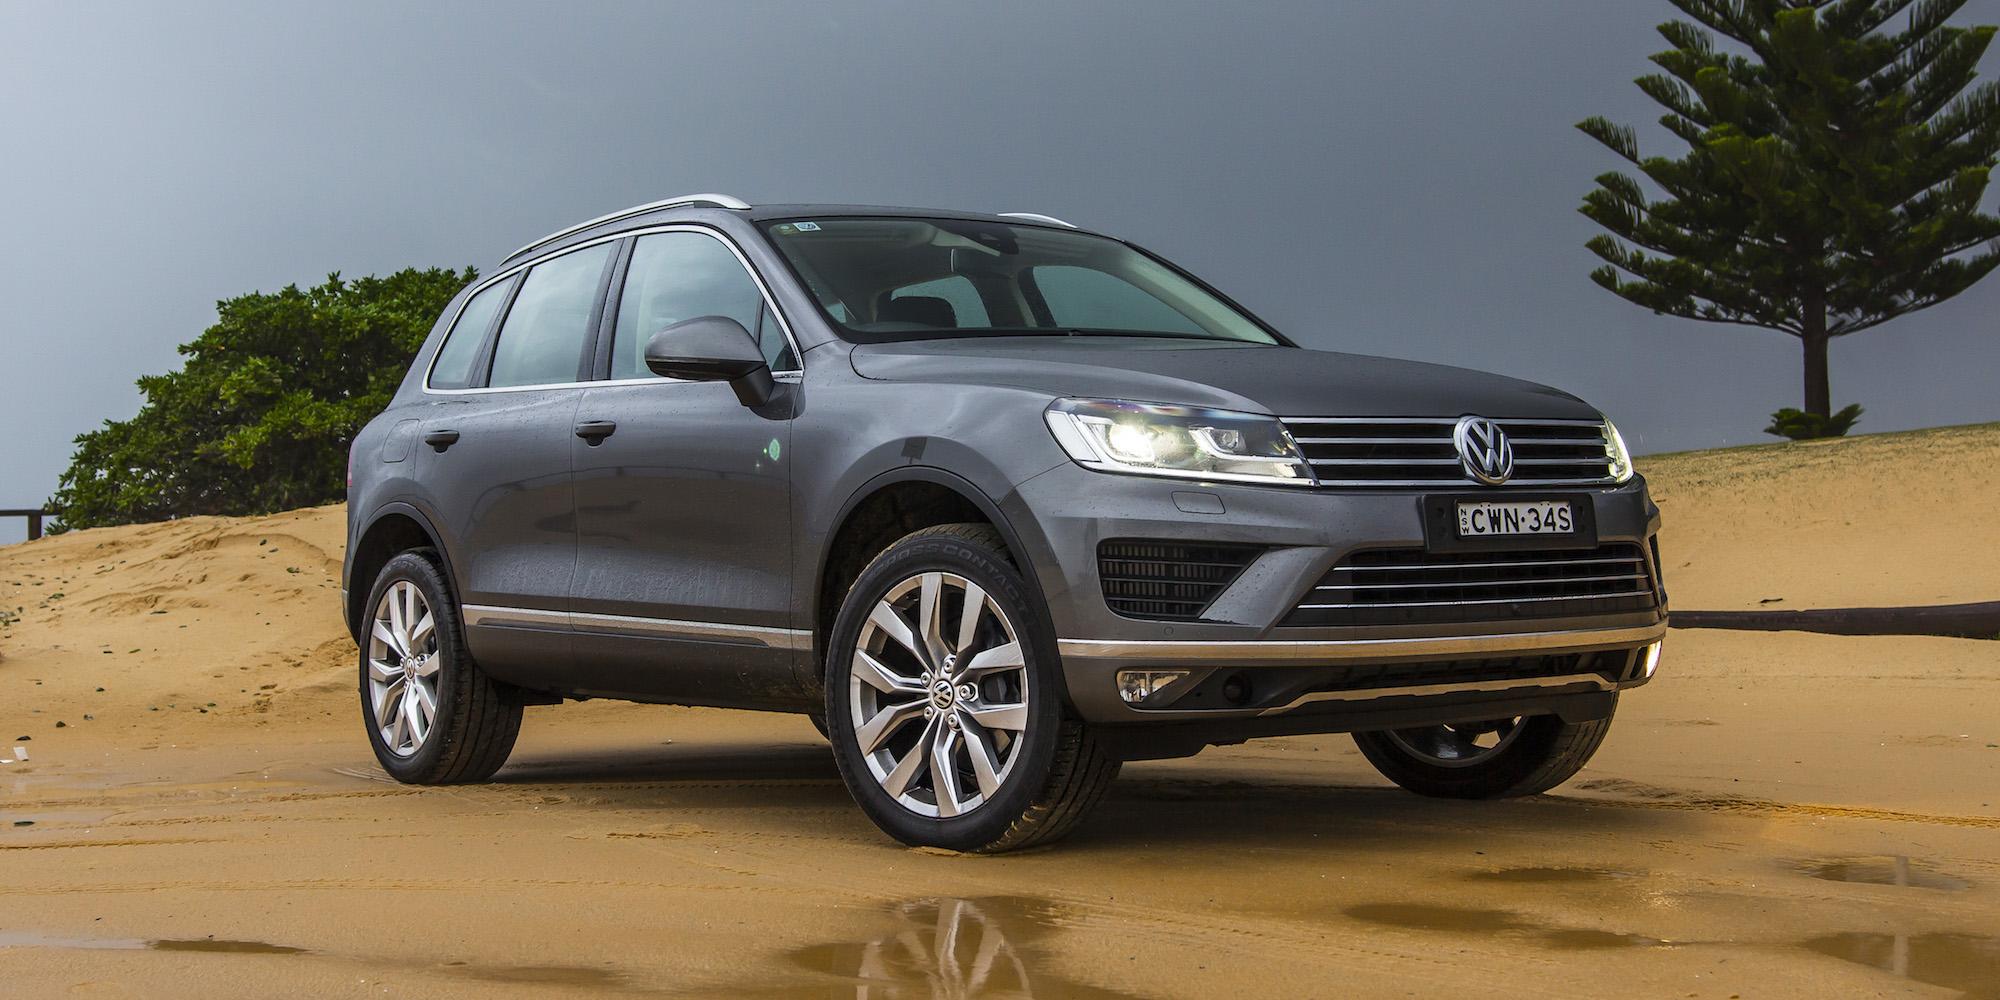 2015 Volkswagen Touareg V6 TDI Review - photos   CarAdvice